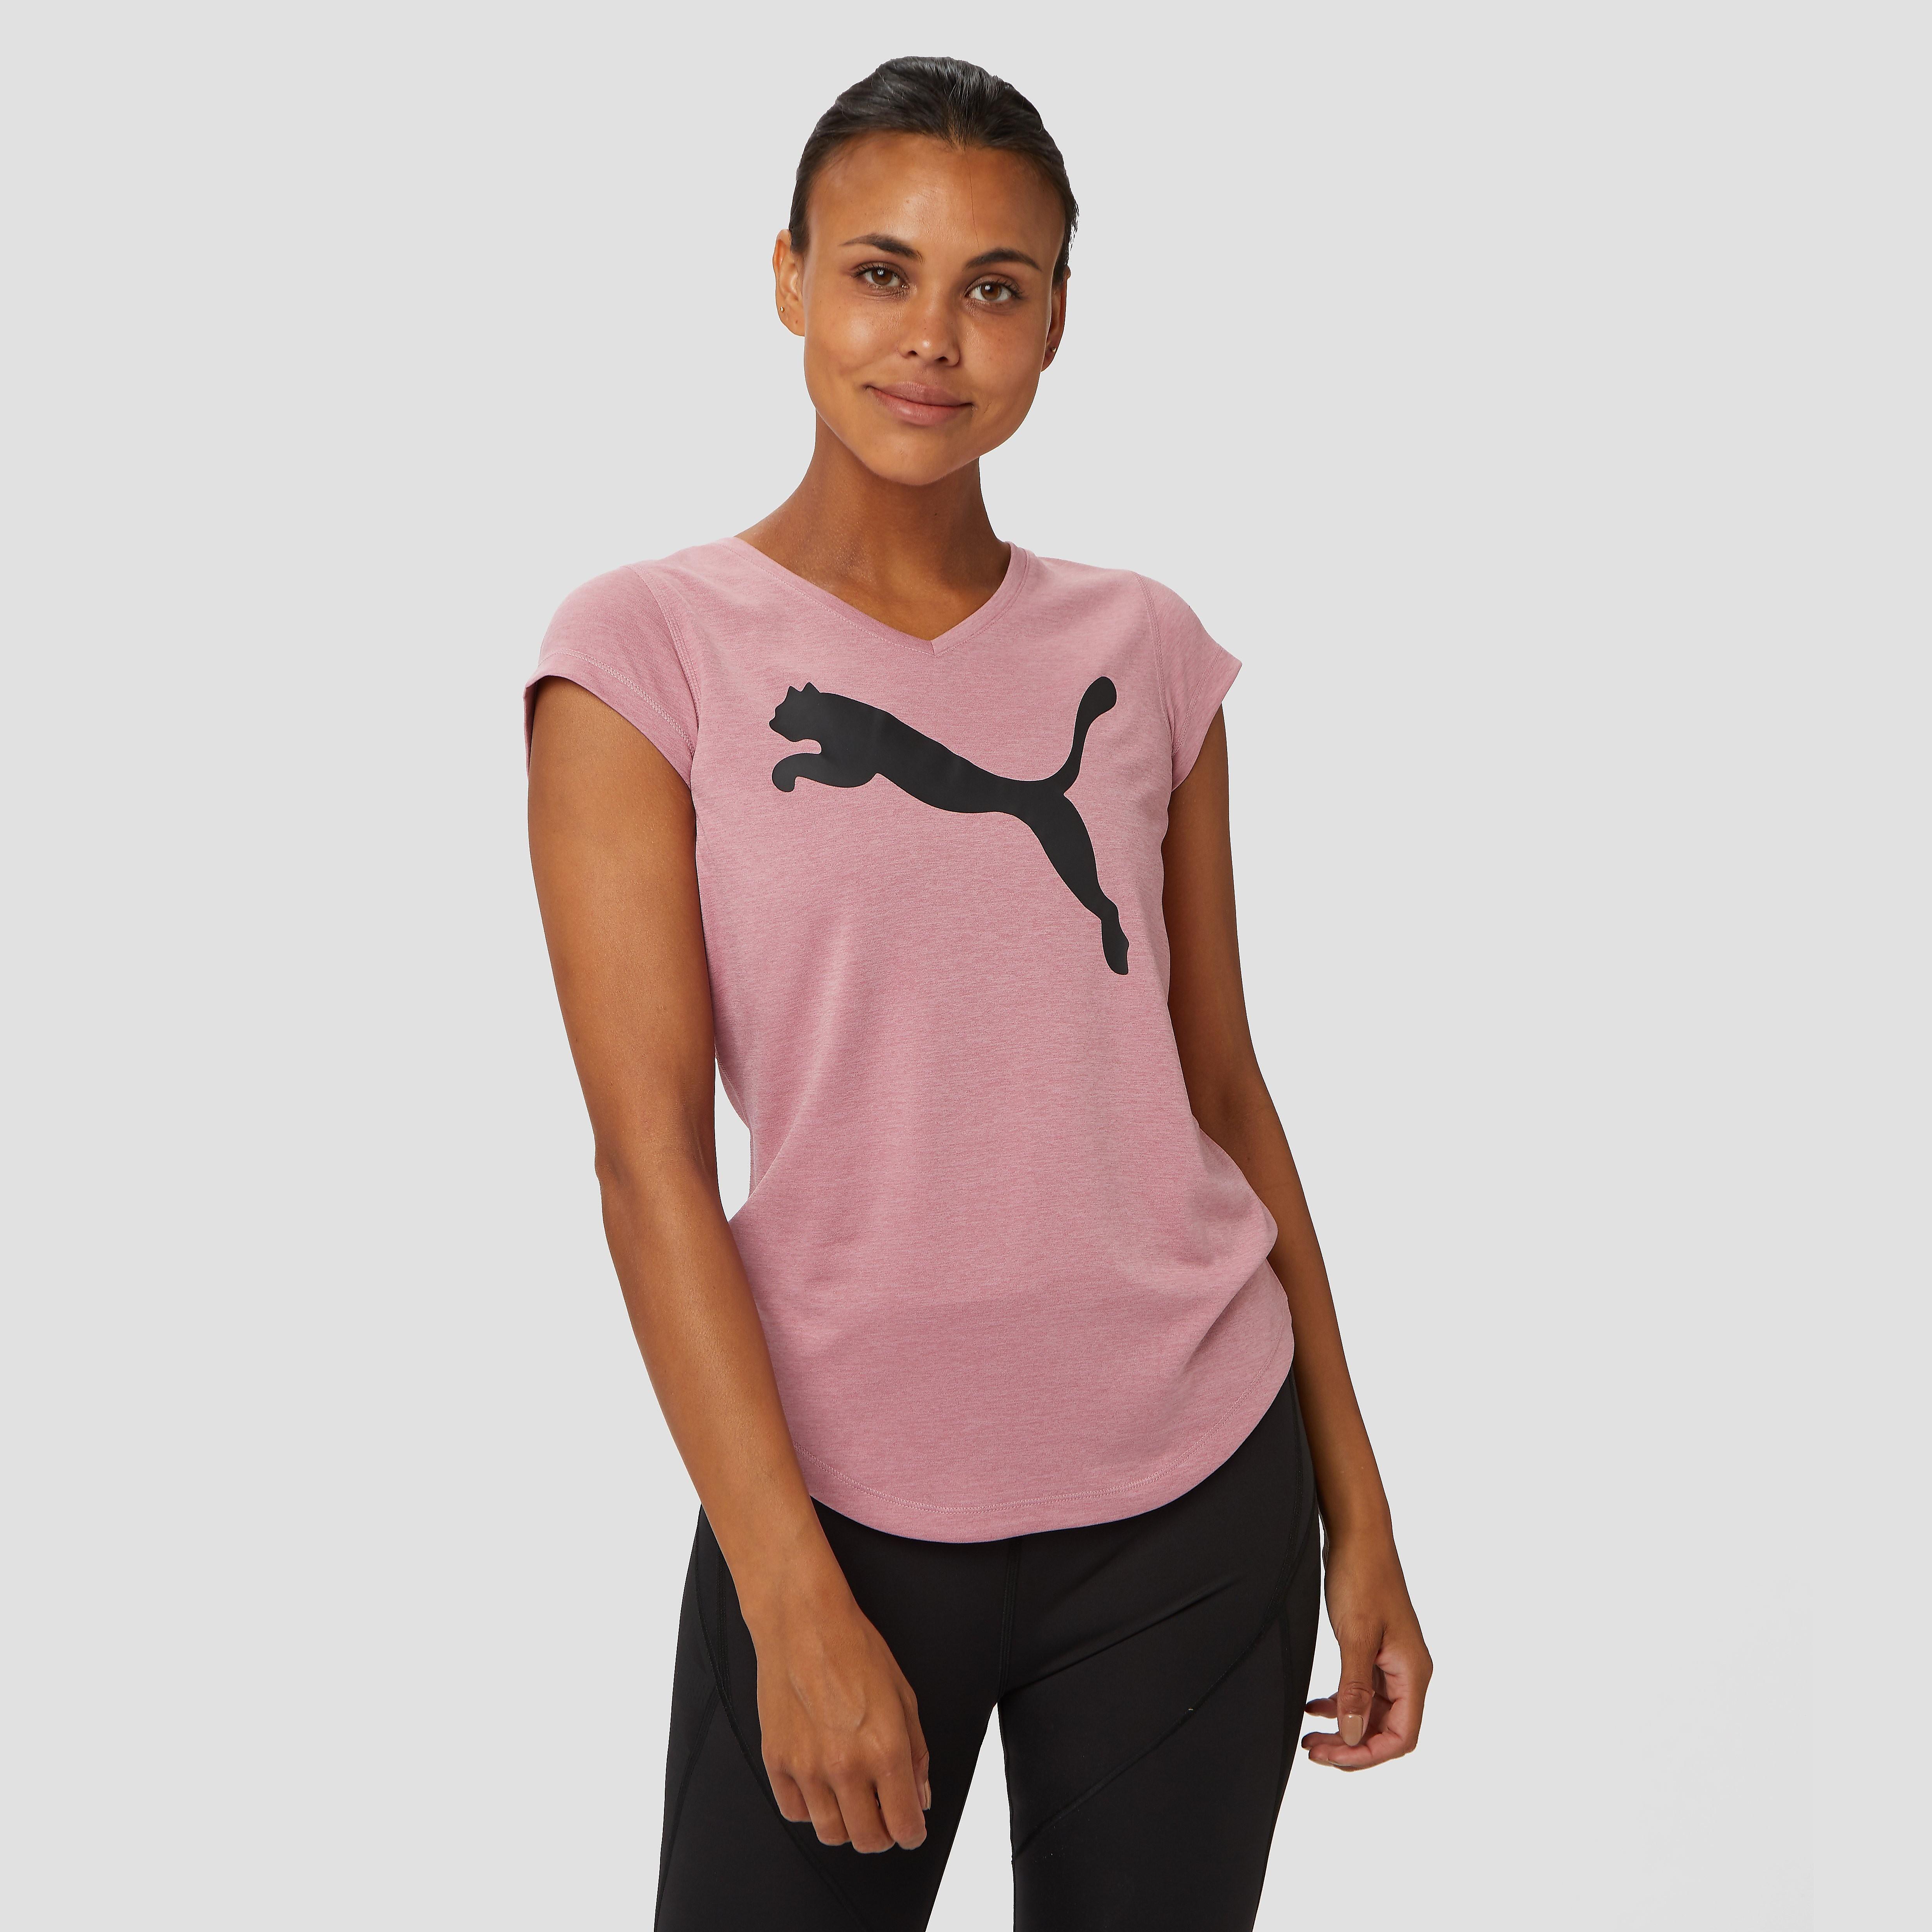 PUMA Heather cat yoga sportshirt roze dames Dames